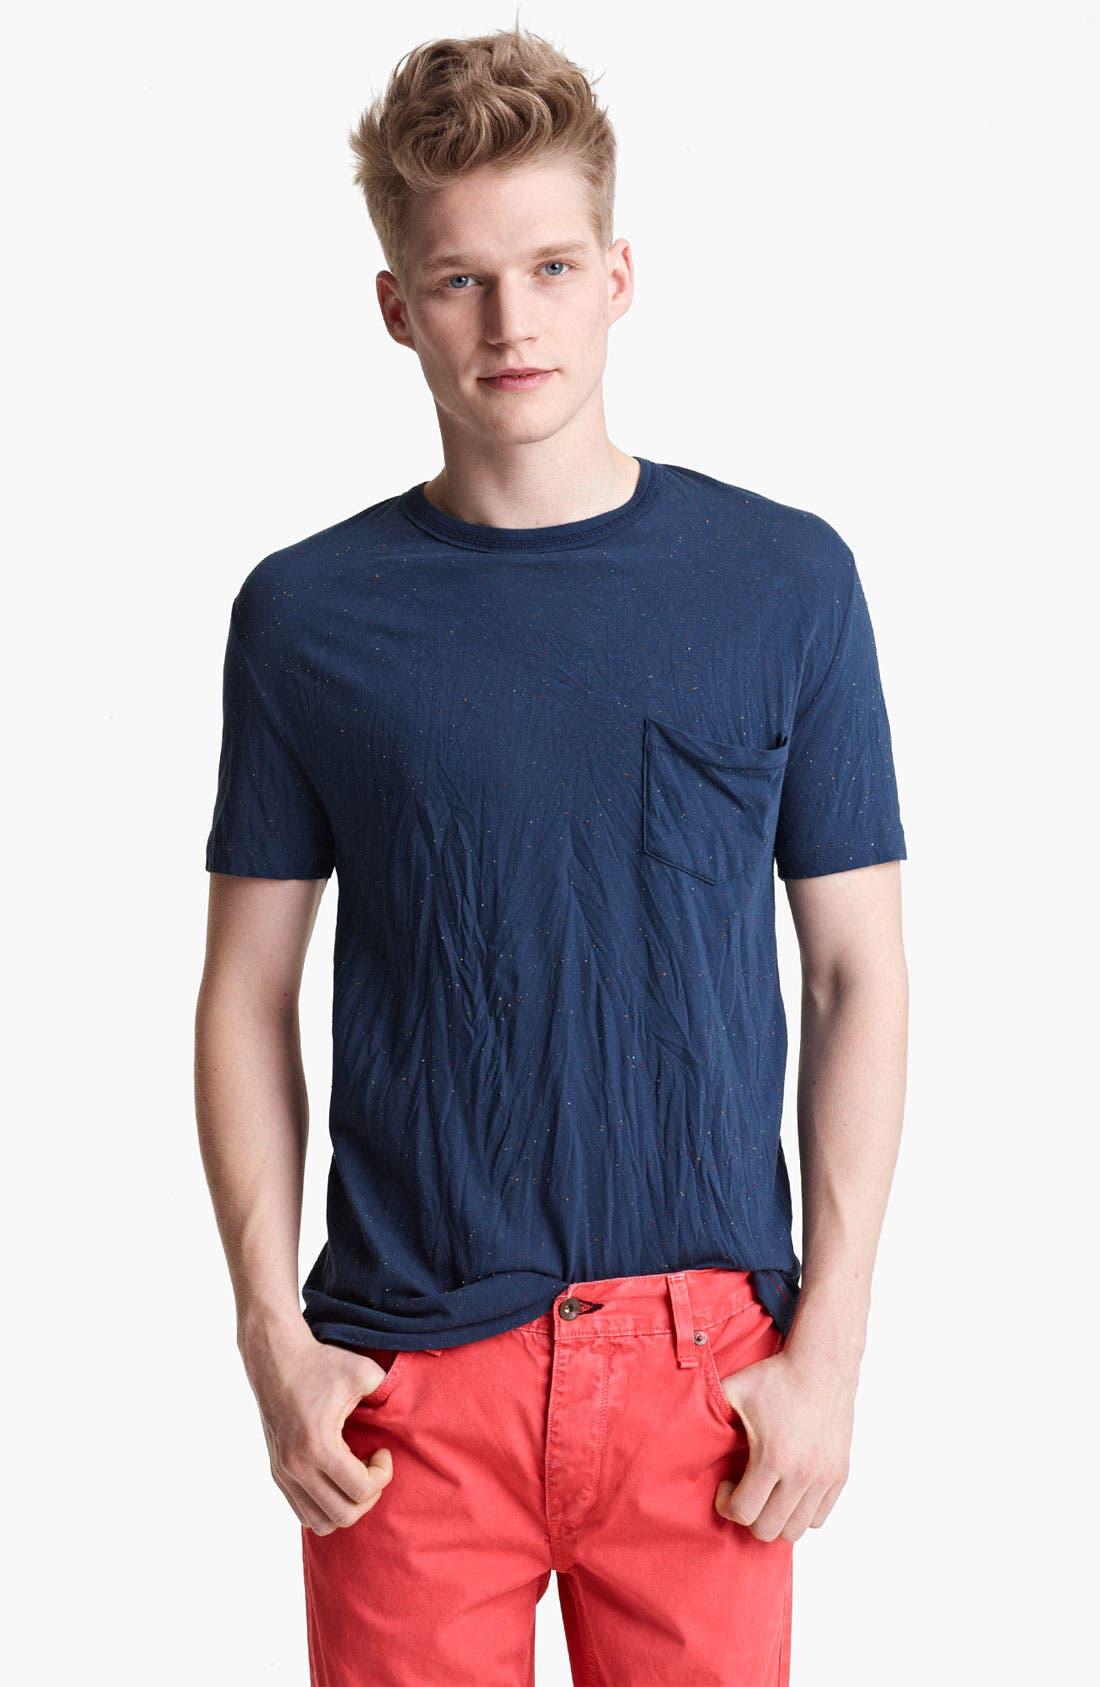 Alternate Image 1 Selected - rag & bone 'Confetti' Pocket T-Shirt